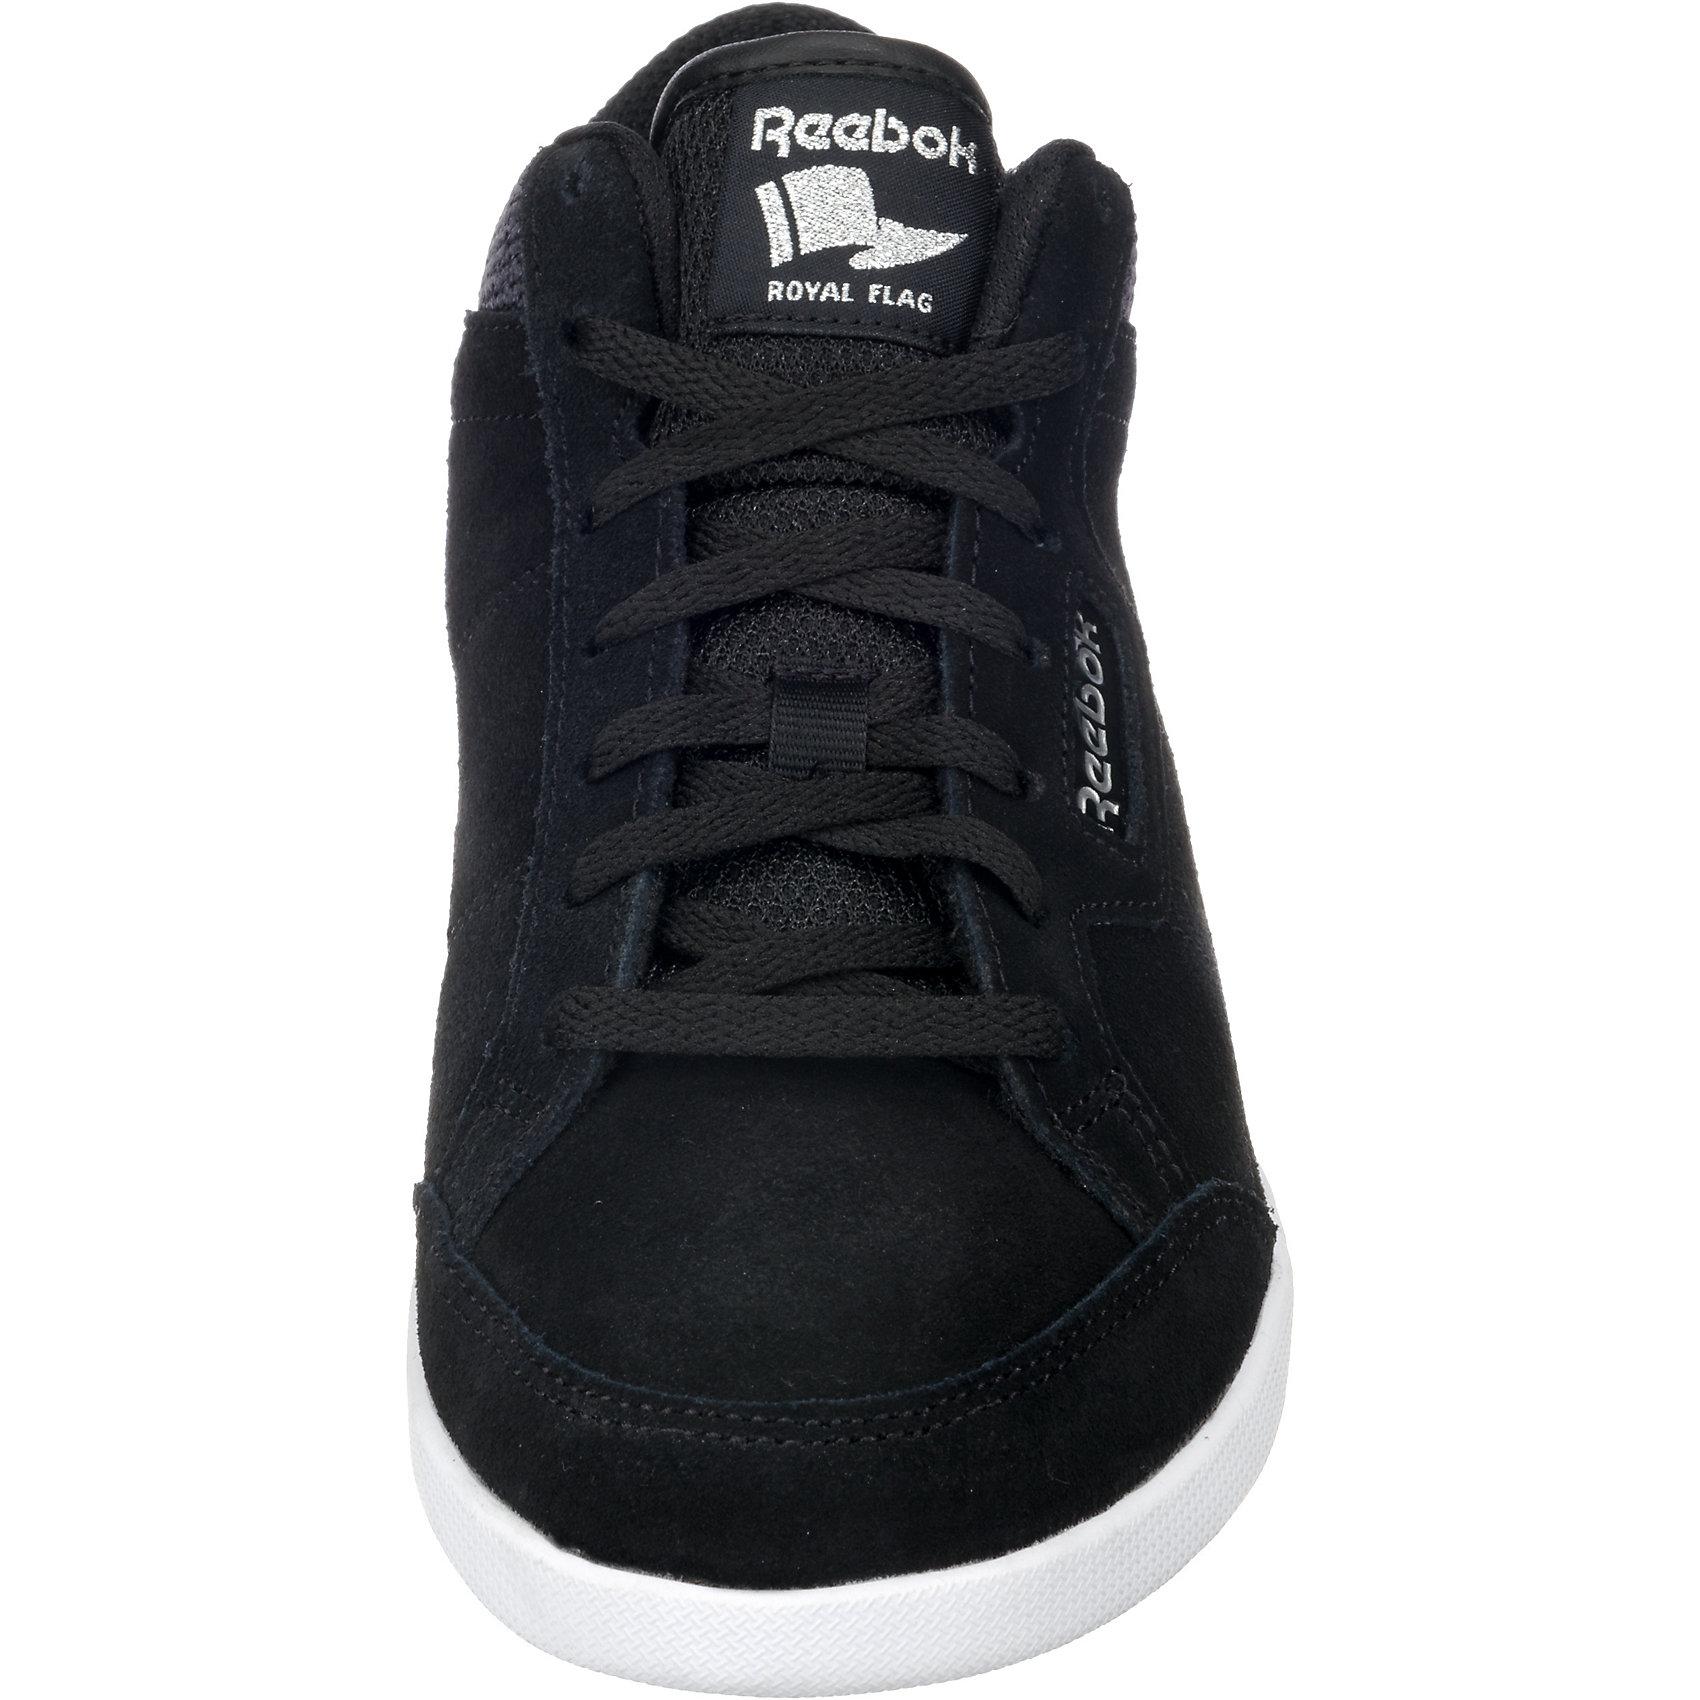 Neu REEBOK ROYAL ANFUSO MS Sneakers Niedrig 7395719 für Damen schwarz schwarz Damen 198393